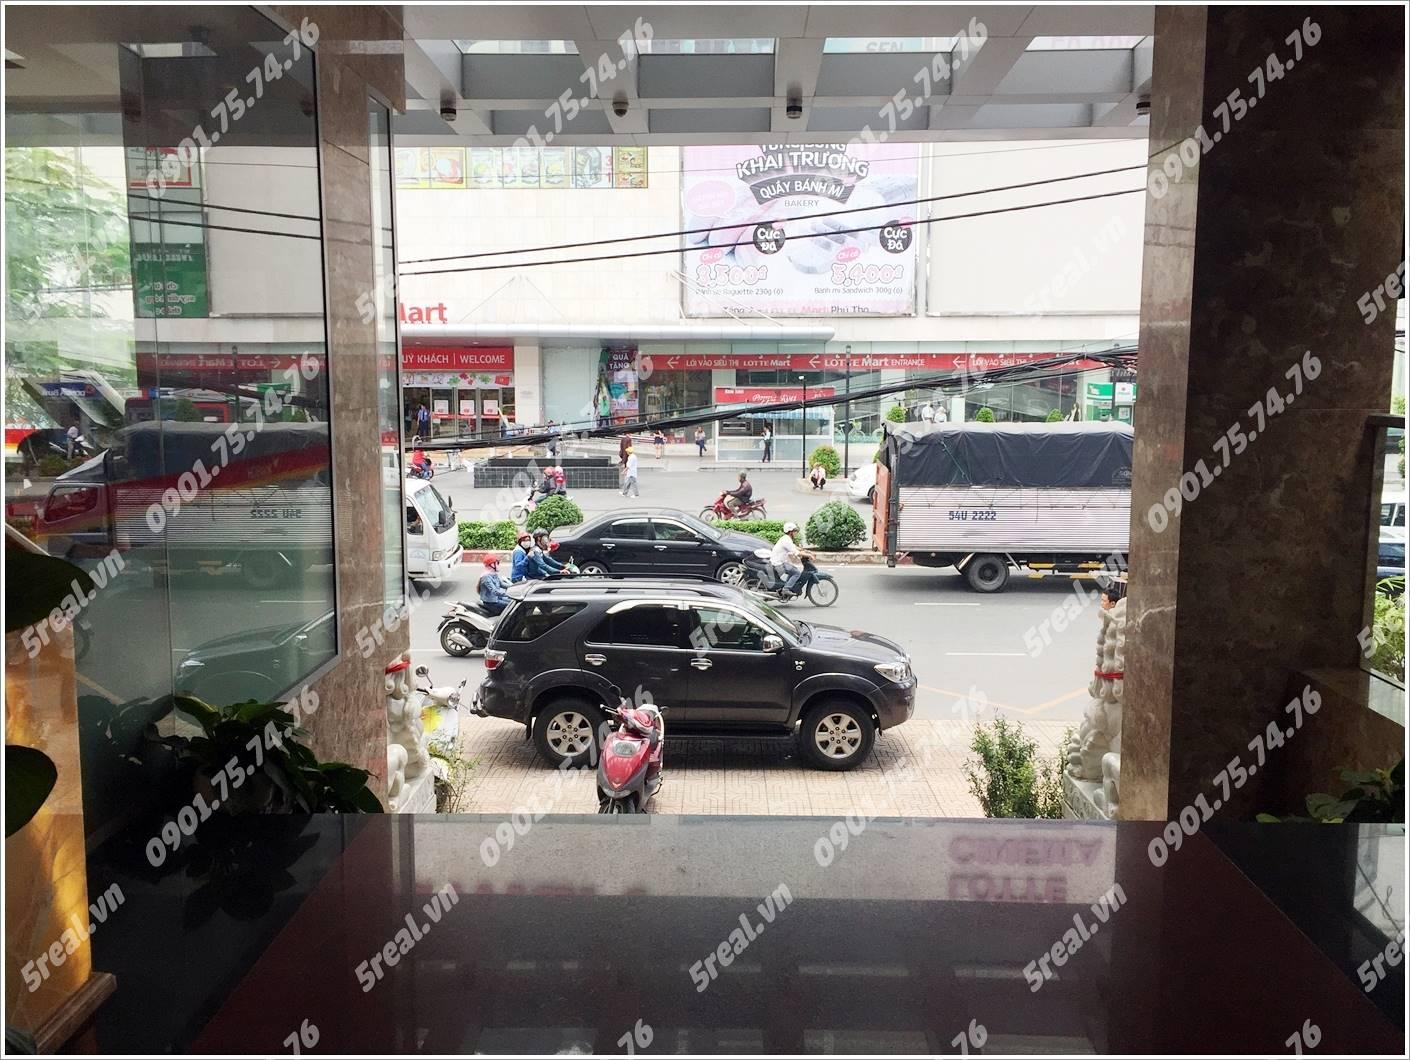 kk-building-le-dai-hanh-quan-11-van-phong-cho-thue-tphcm-5real.vn-04